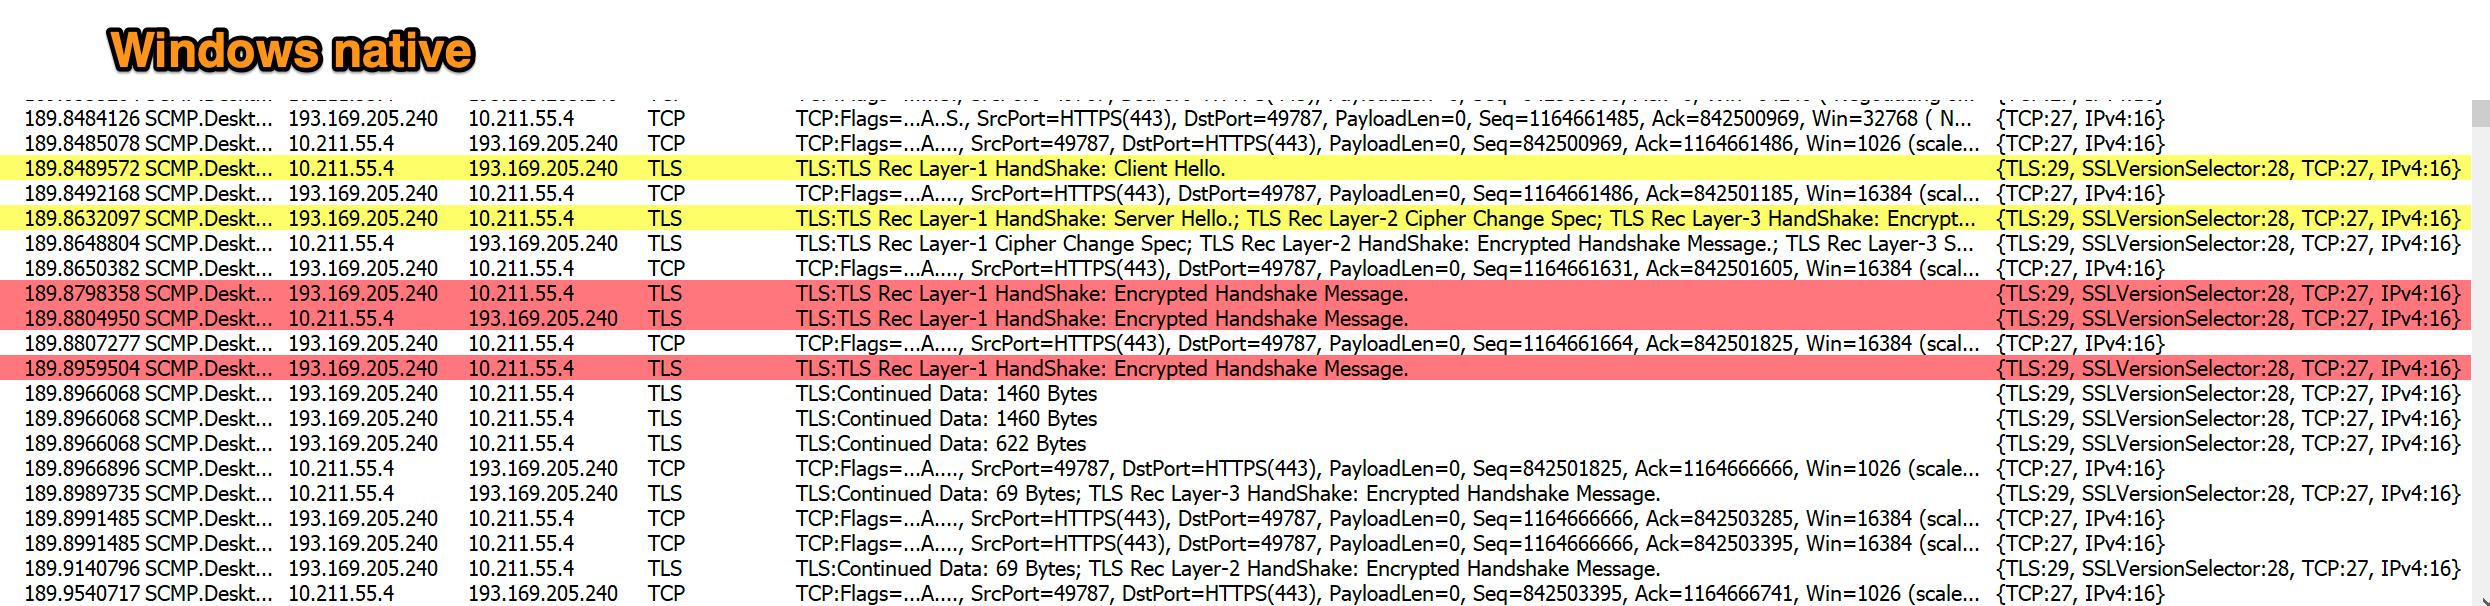 Windows_native_handshake.png